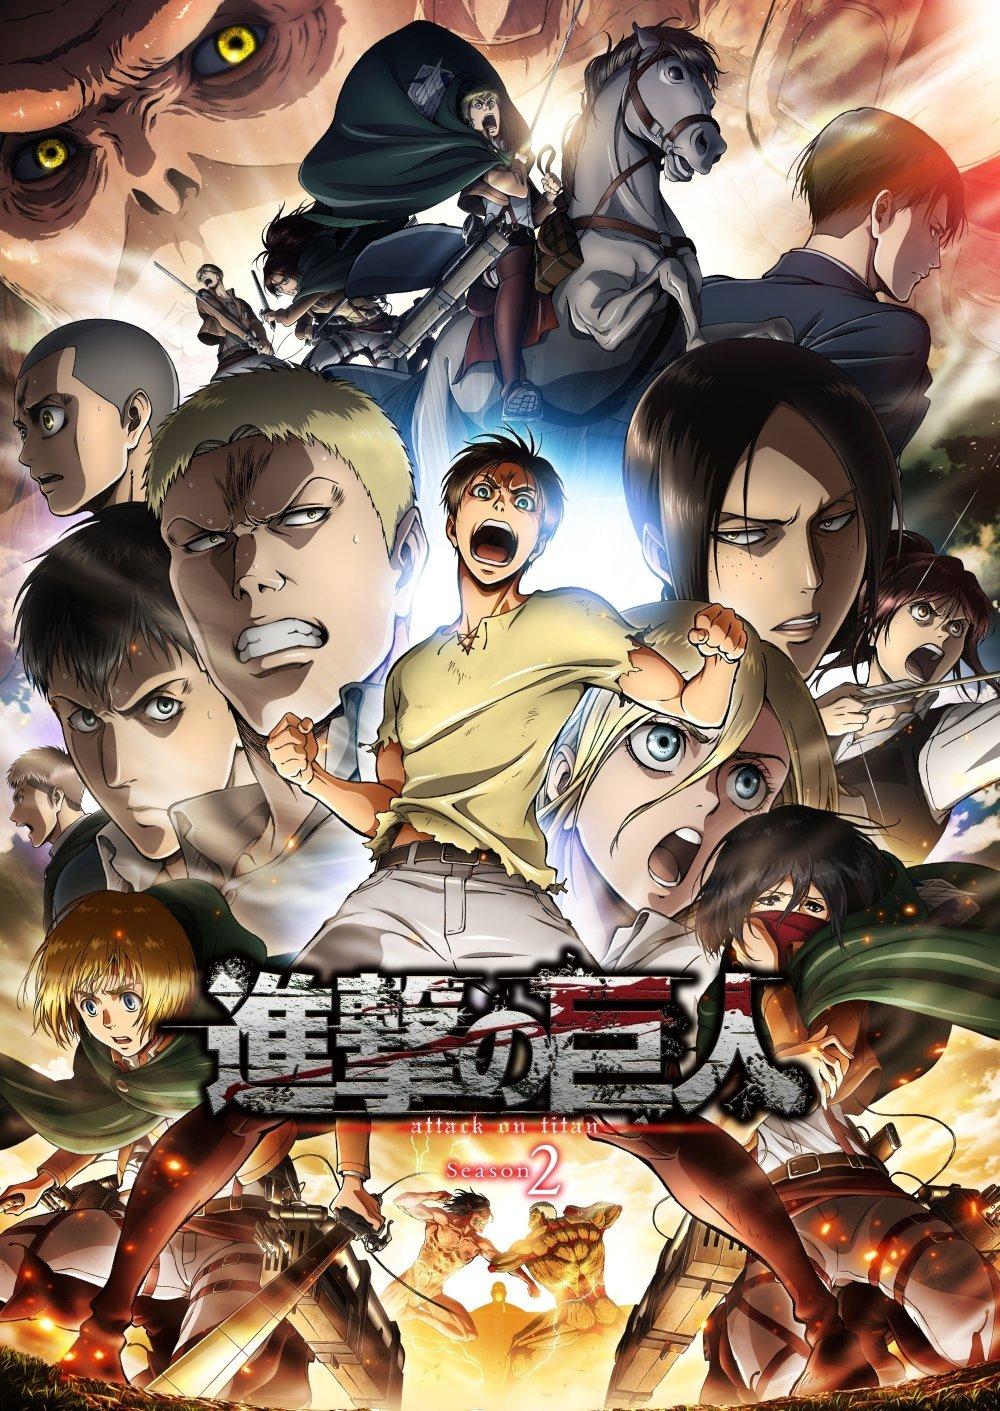 TVアニメ「進撃の巨人」Season 2 スチールブック steelbook